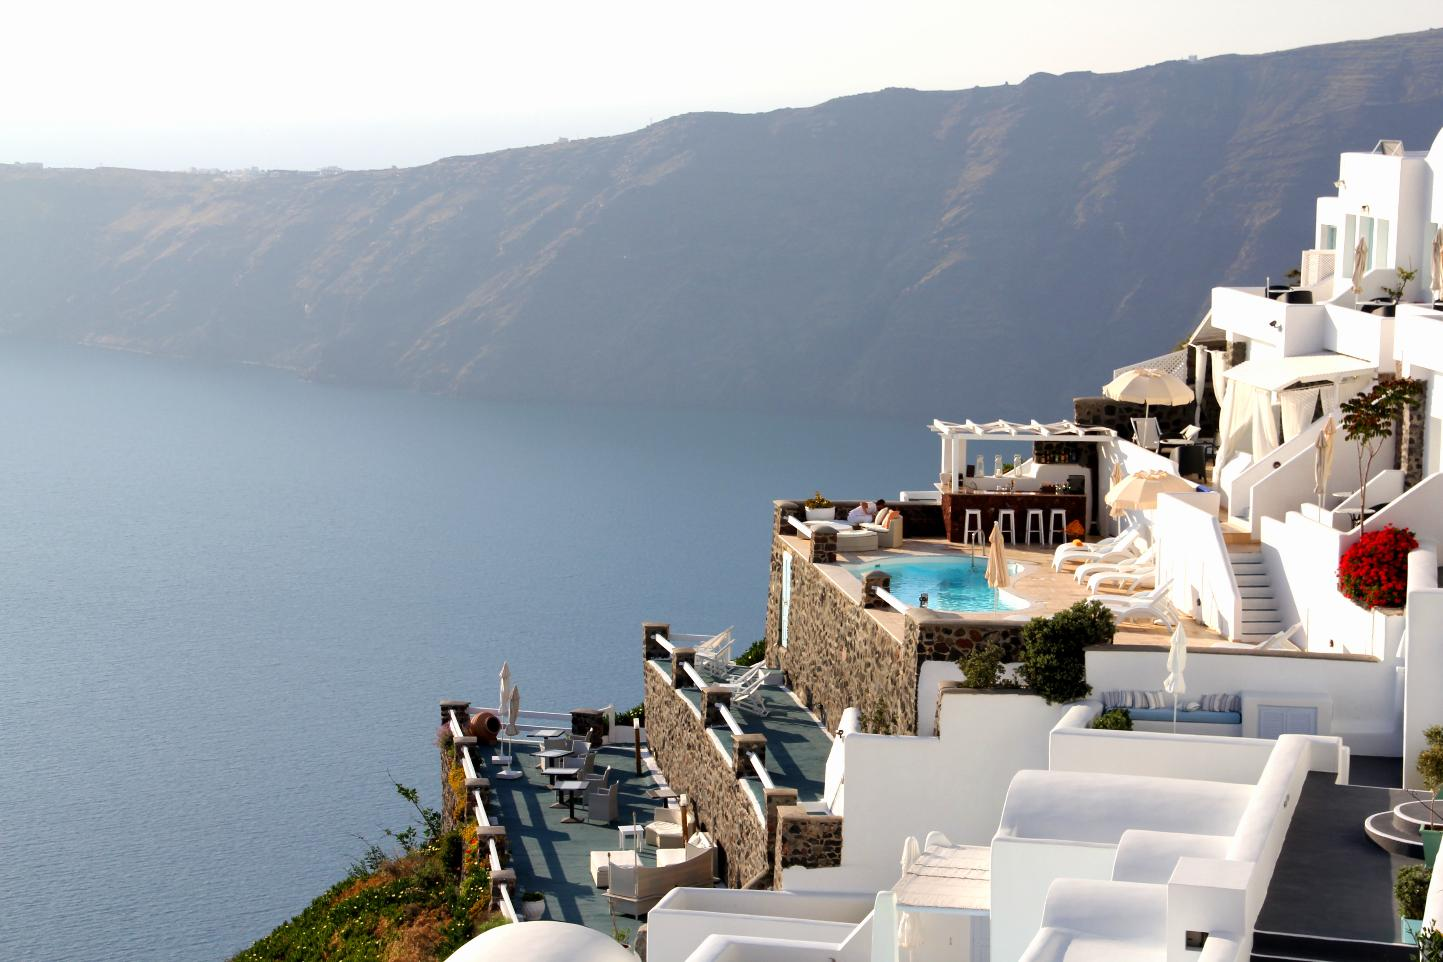 Santorini Grace Pool & Rooms © JonoVernon-Powell.com